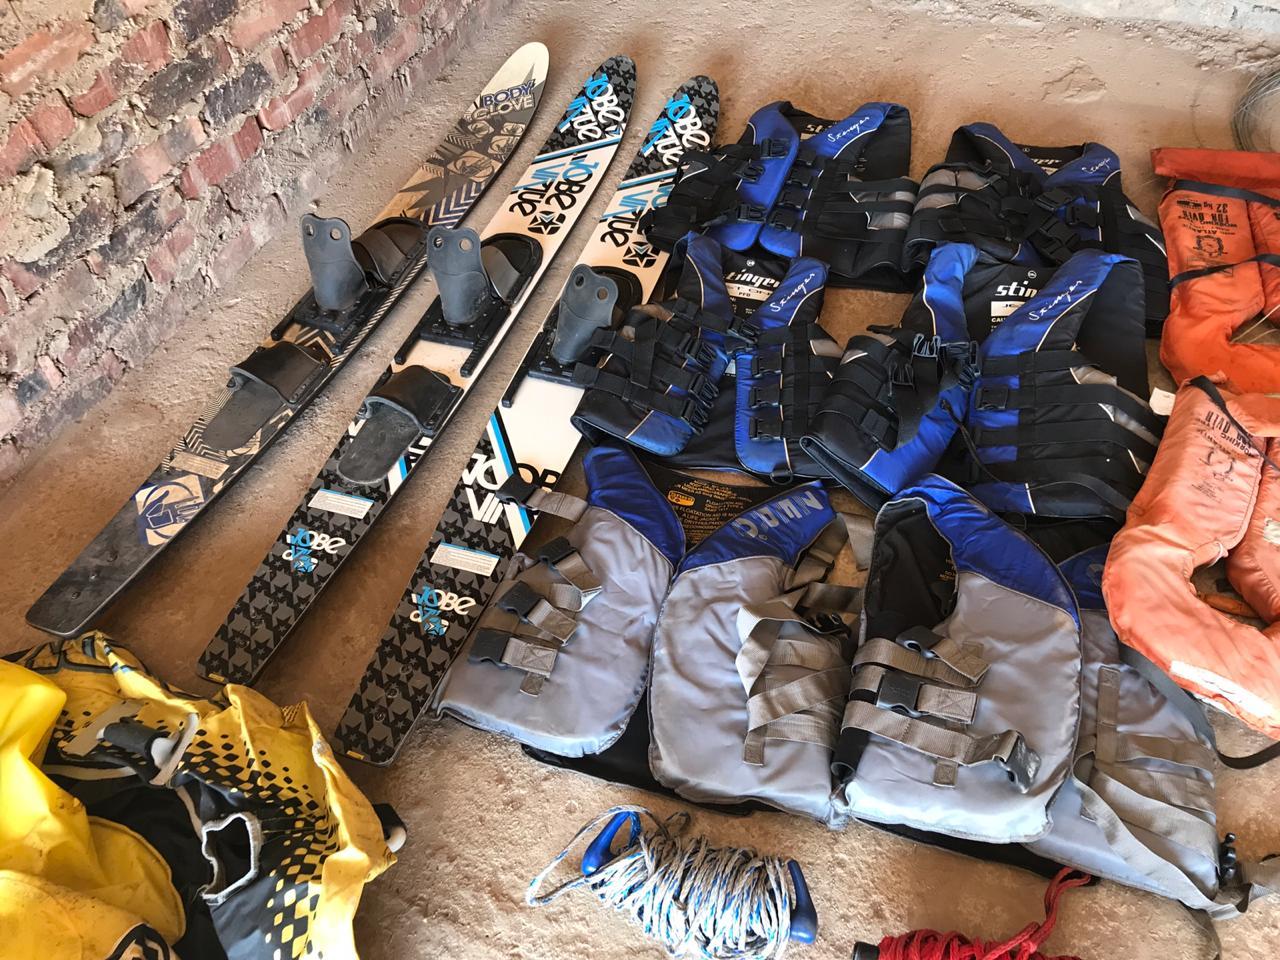 Life Jackets, Ski's, Ski Rope and Tube